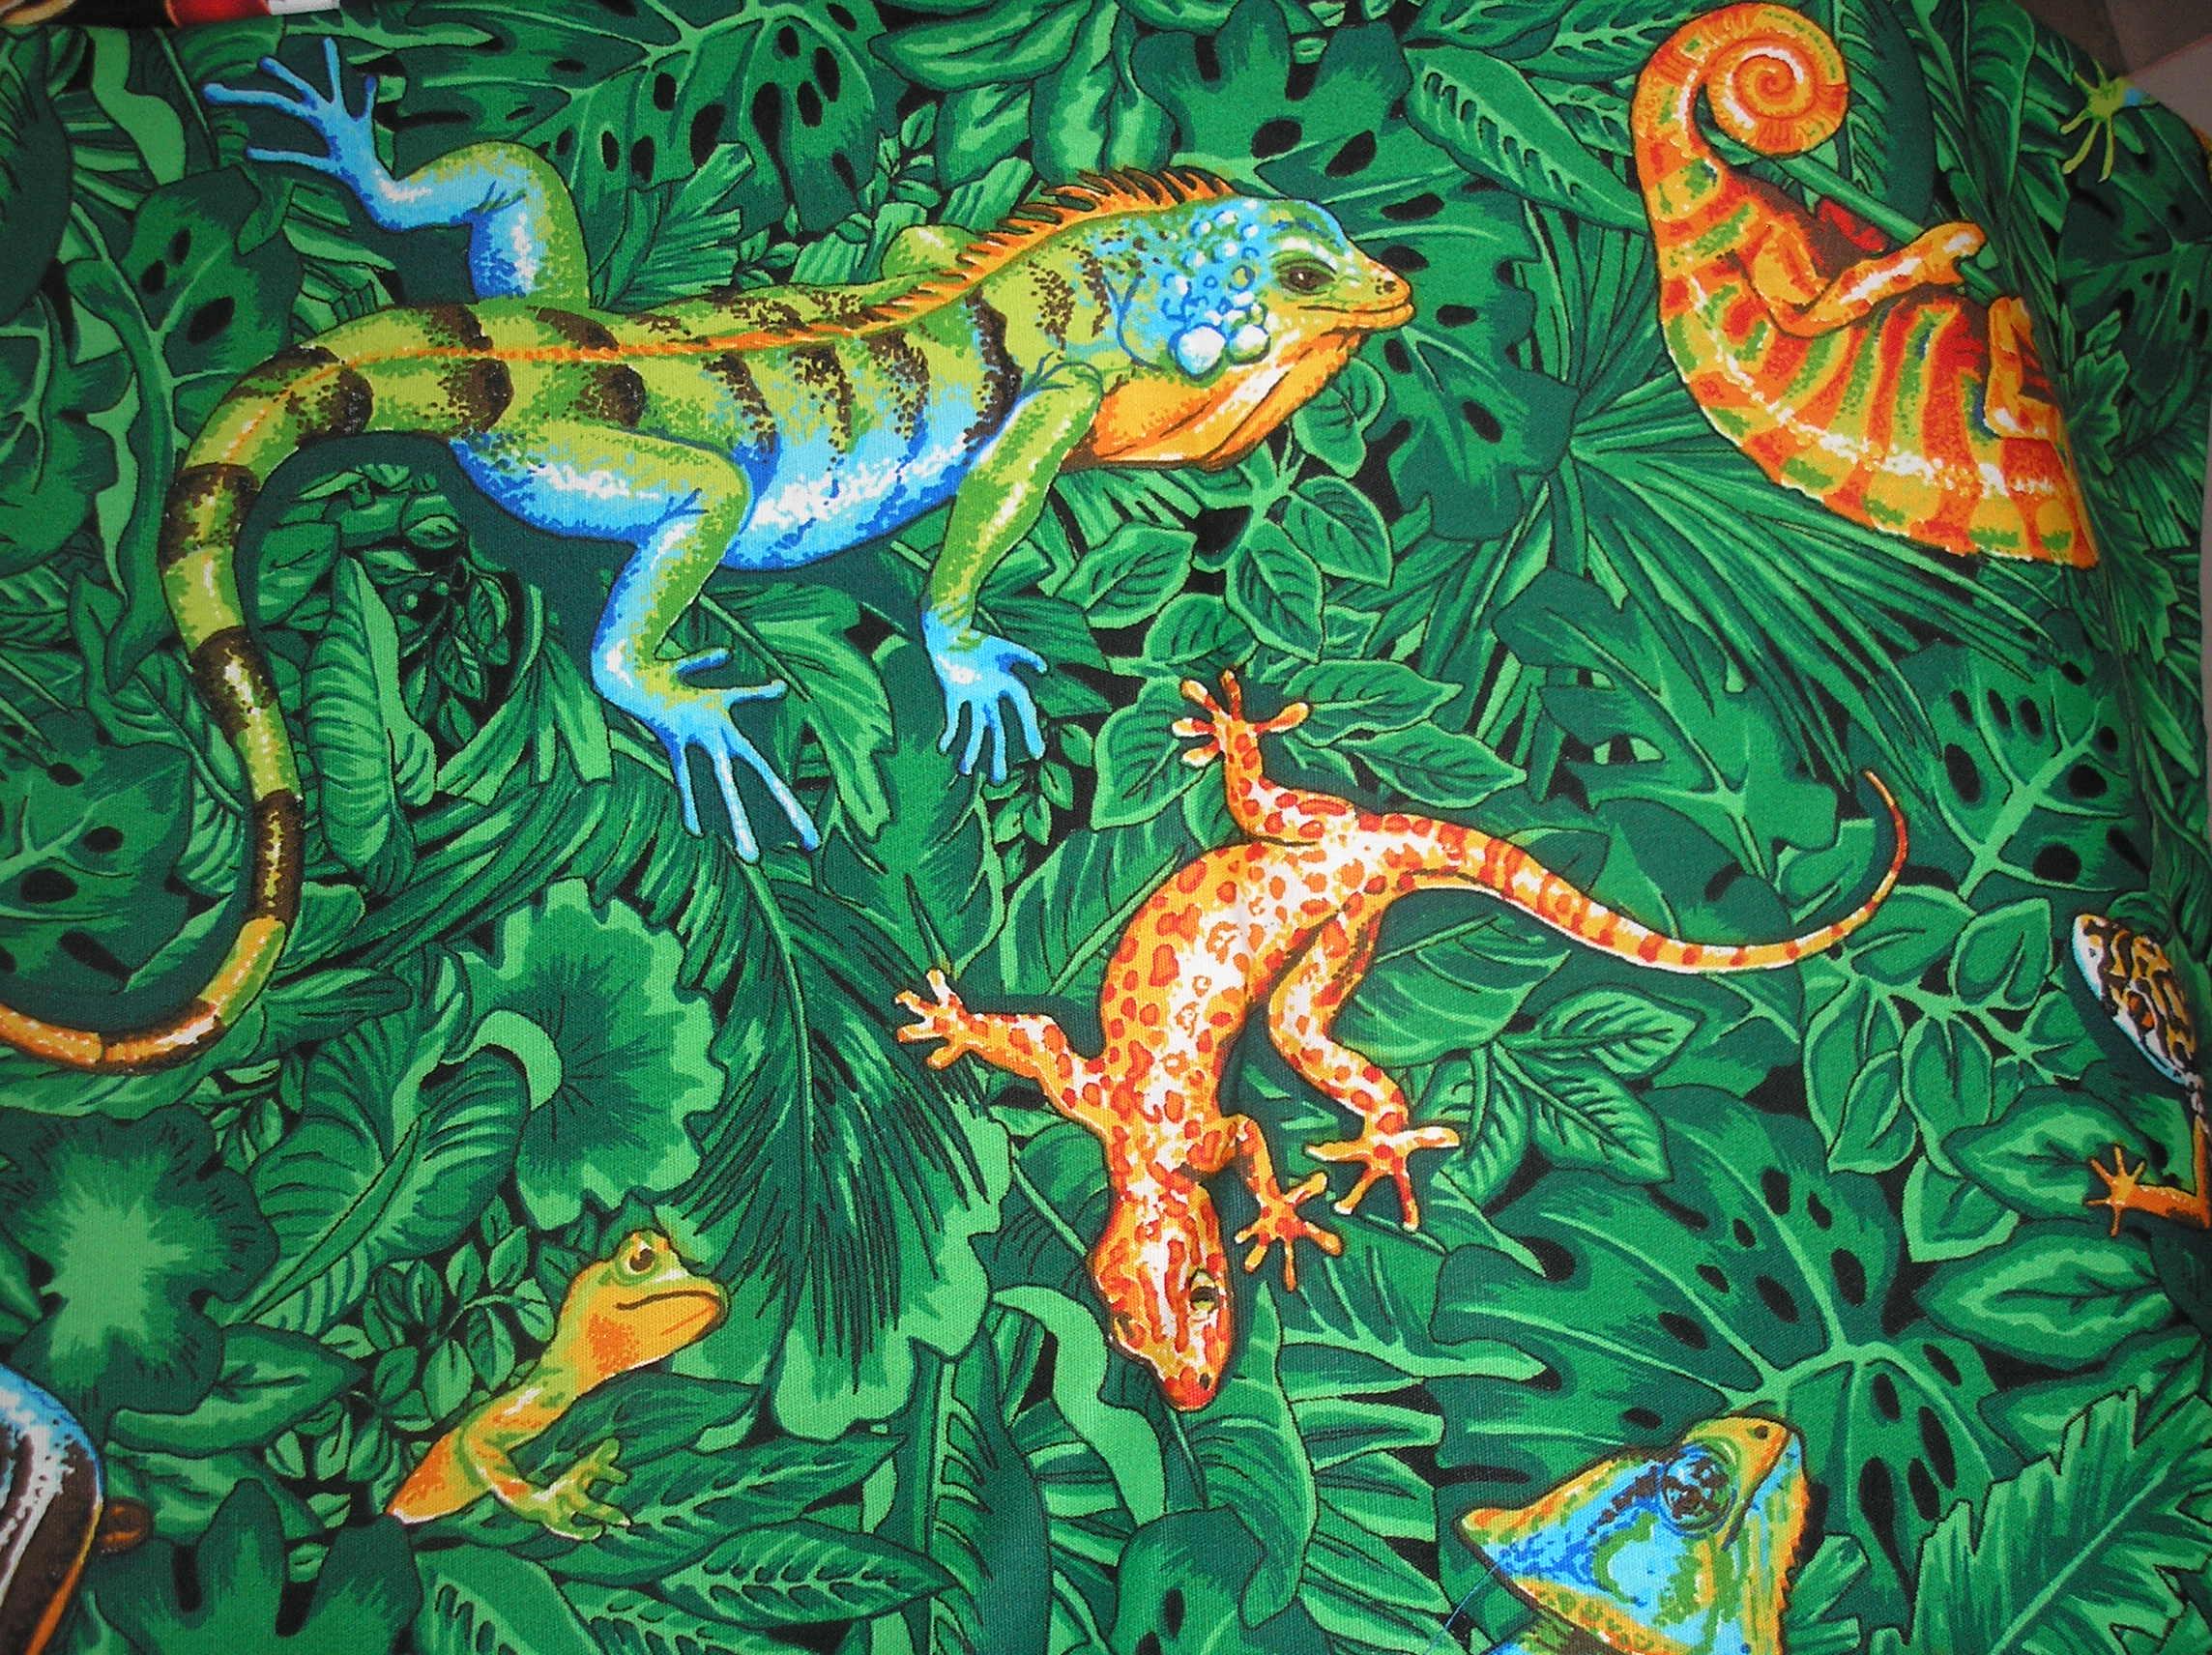 lizards on green